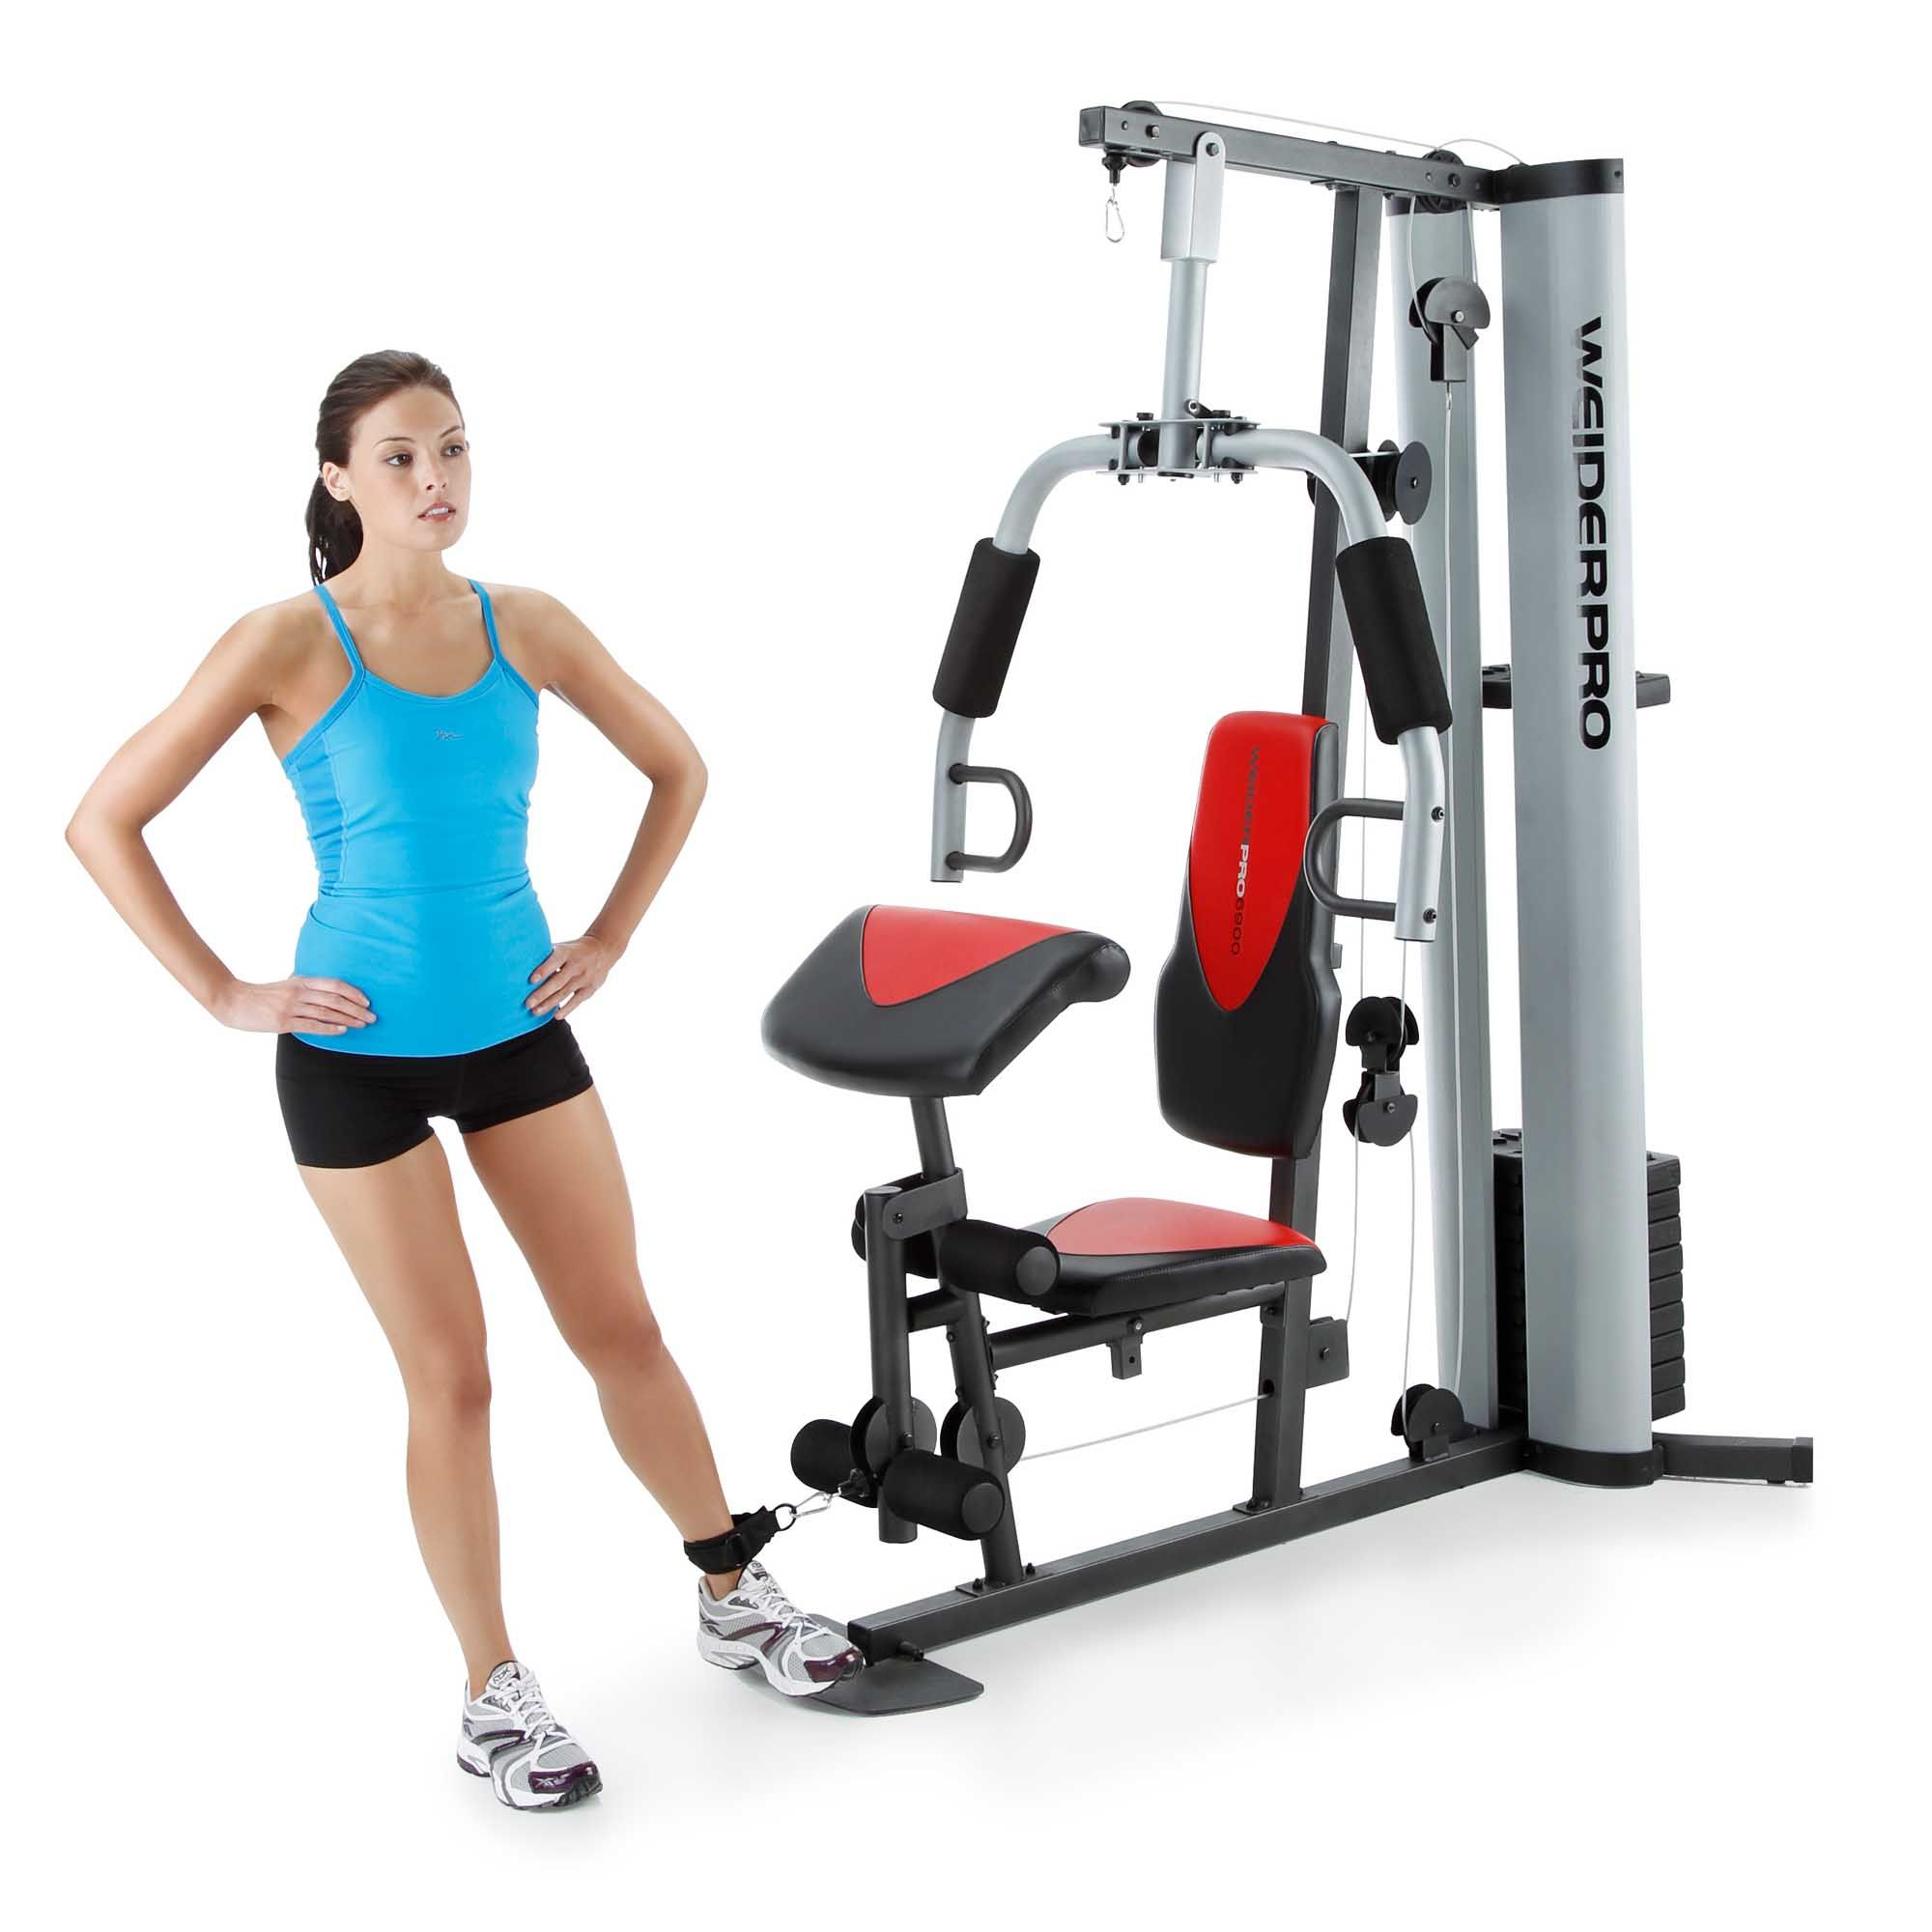 Weider multi gym